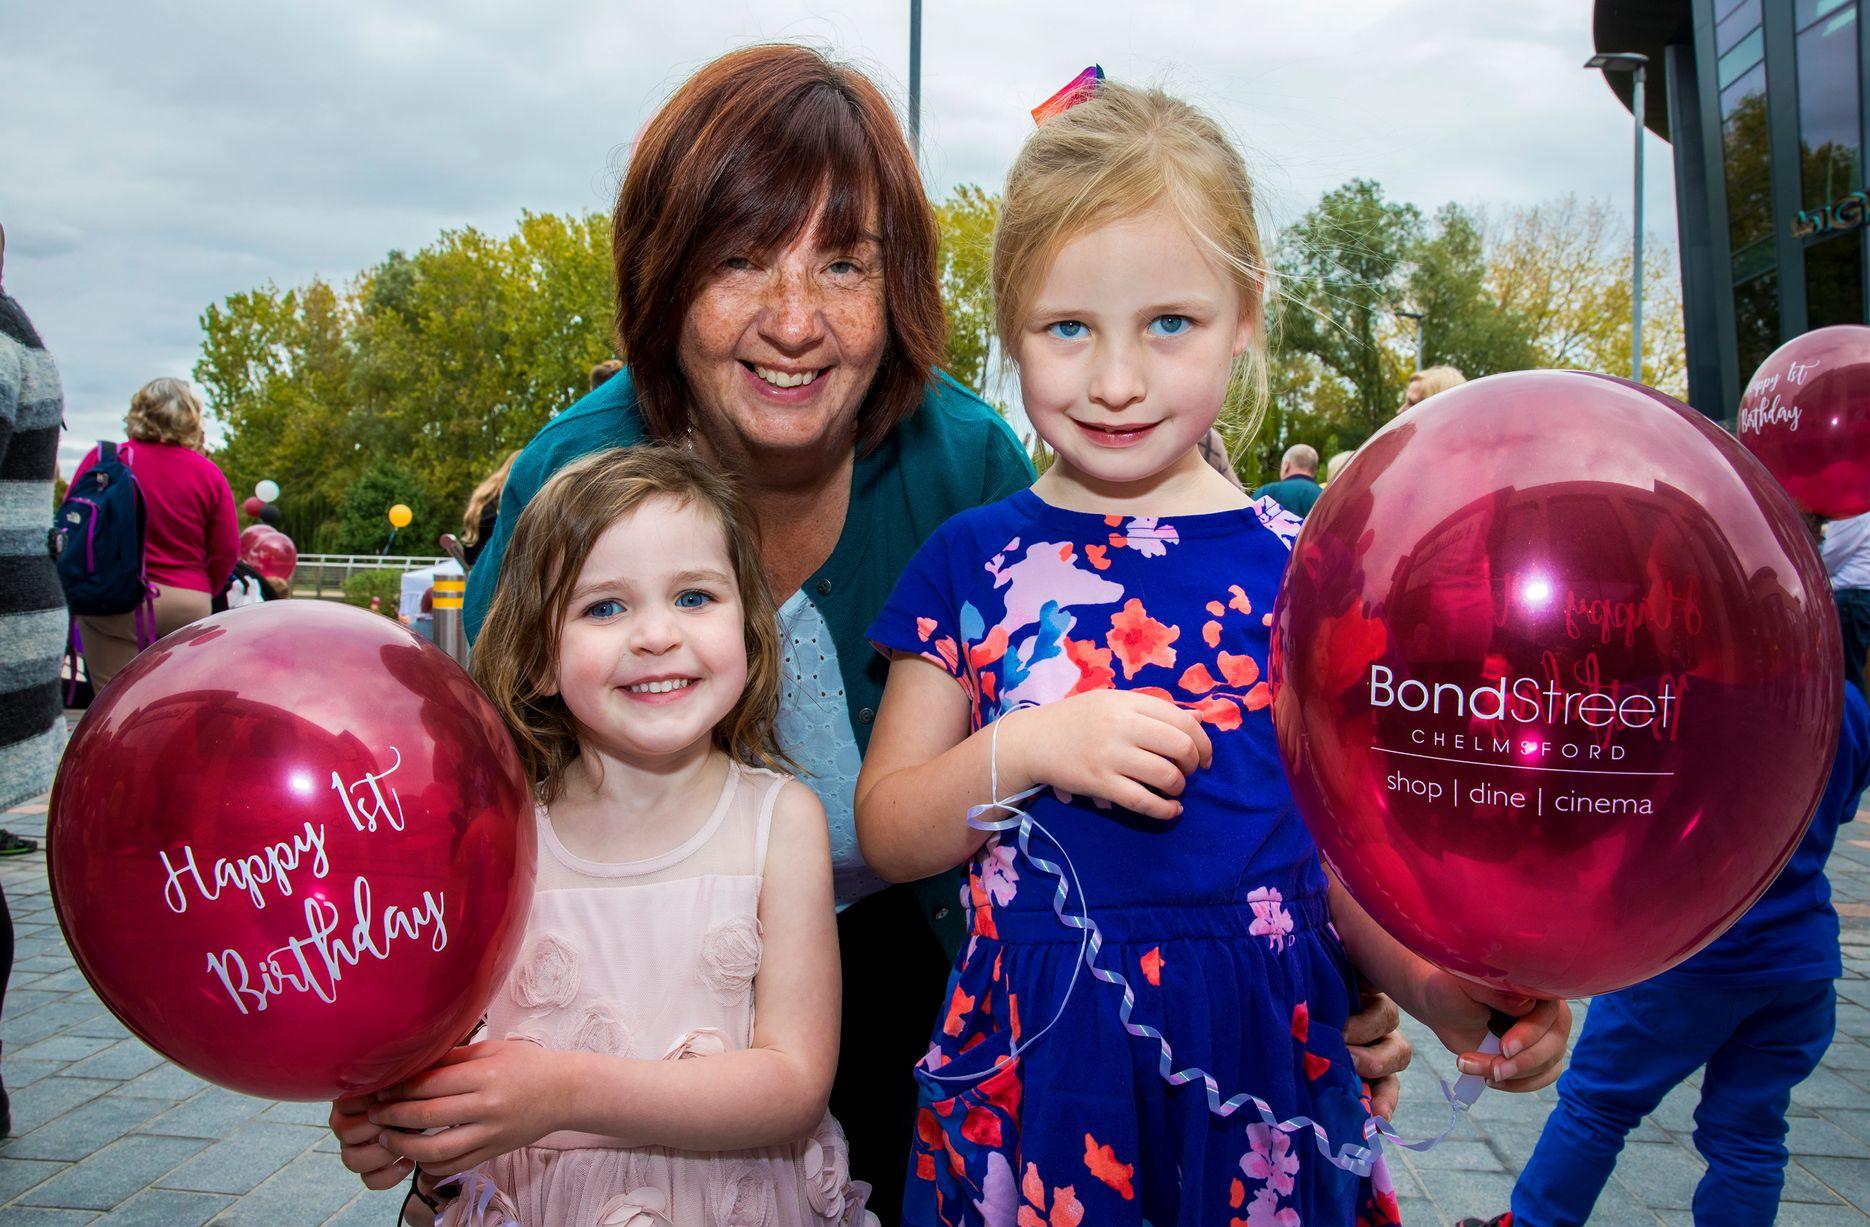 Bond-Street-first-birthday-Chelmsford-kids-balloons-1.jpg